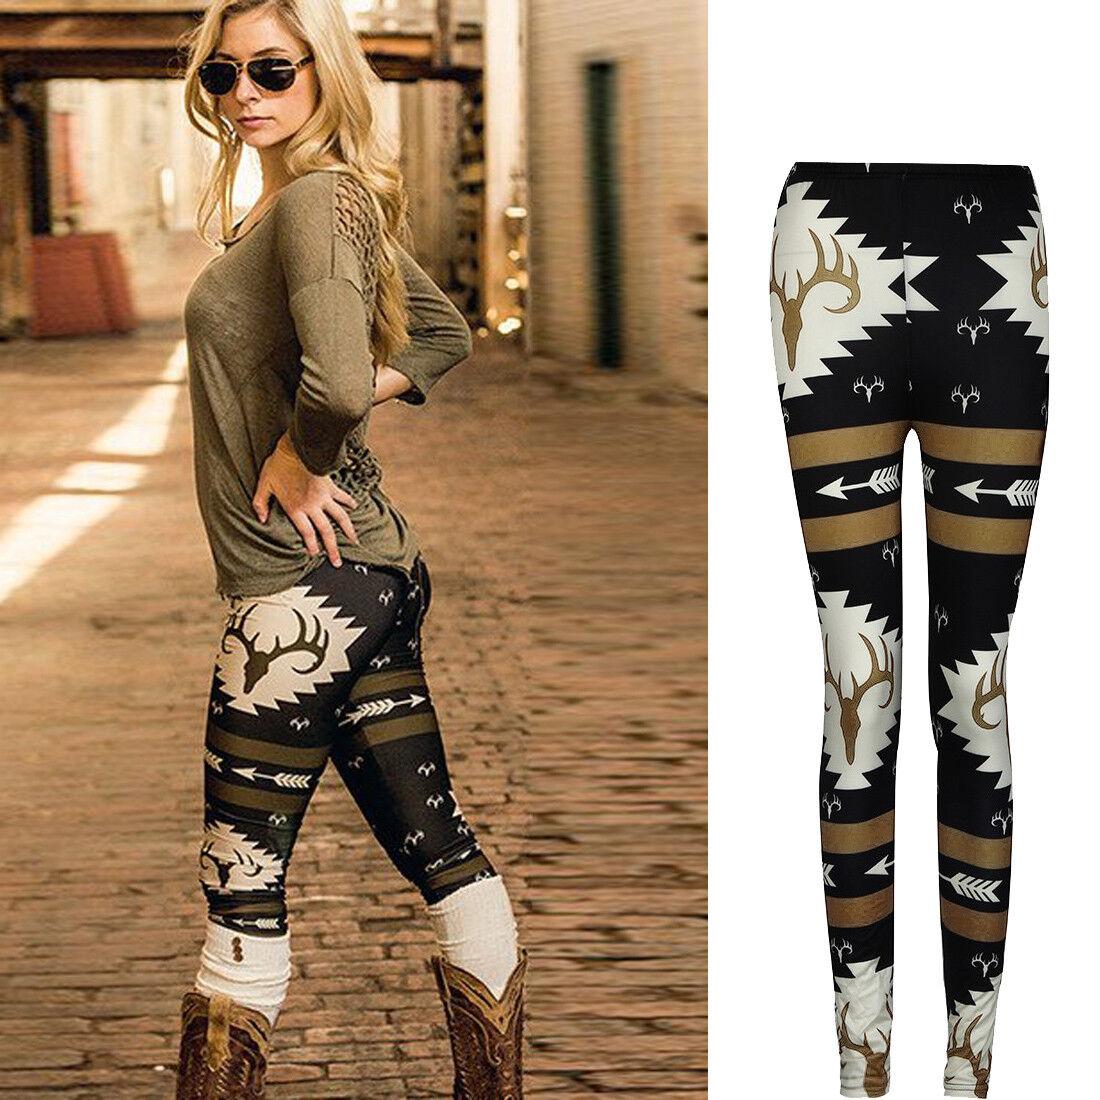 Leggings - Fashion Women Casual Christmas Skinny Elk Deer Printed Stretchy Pants Leggings